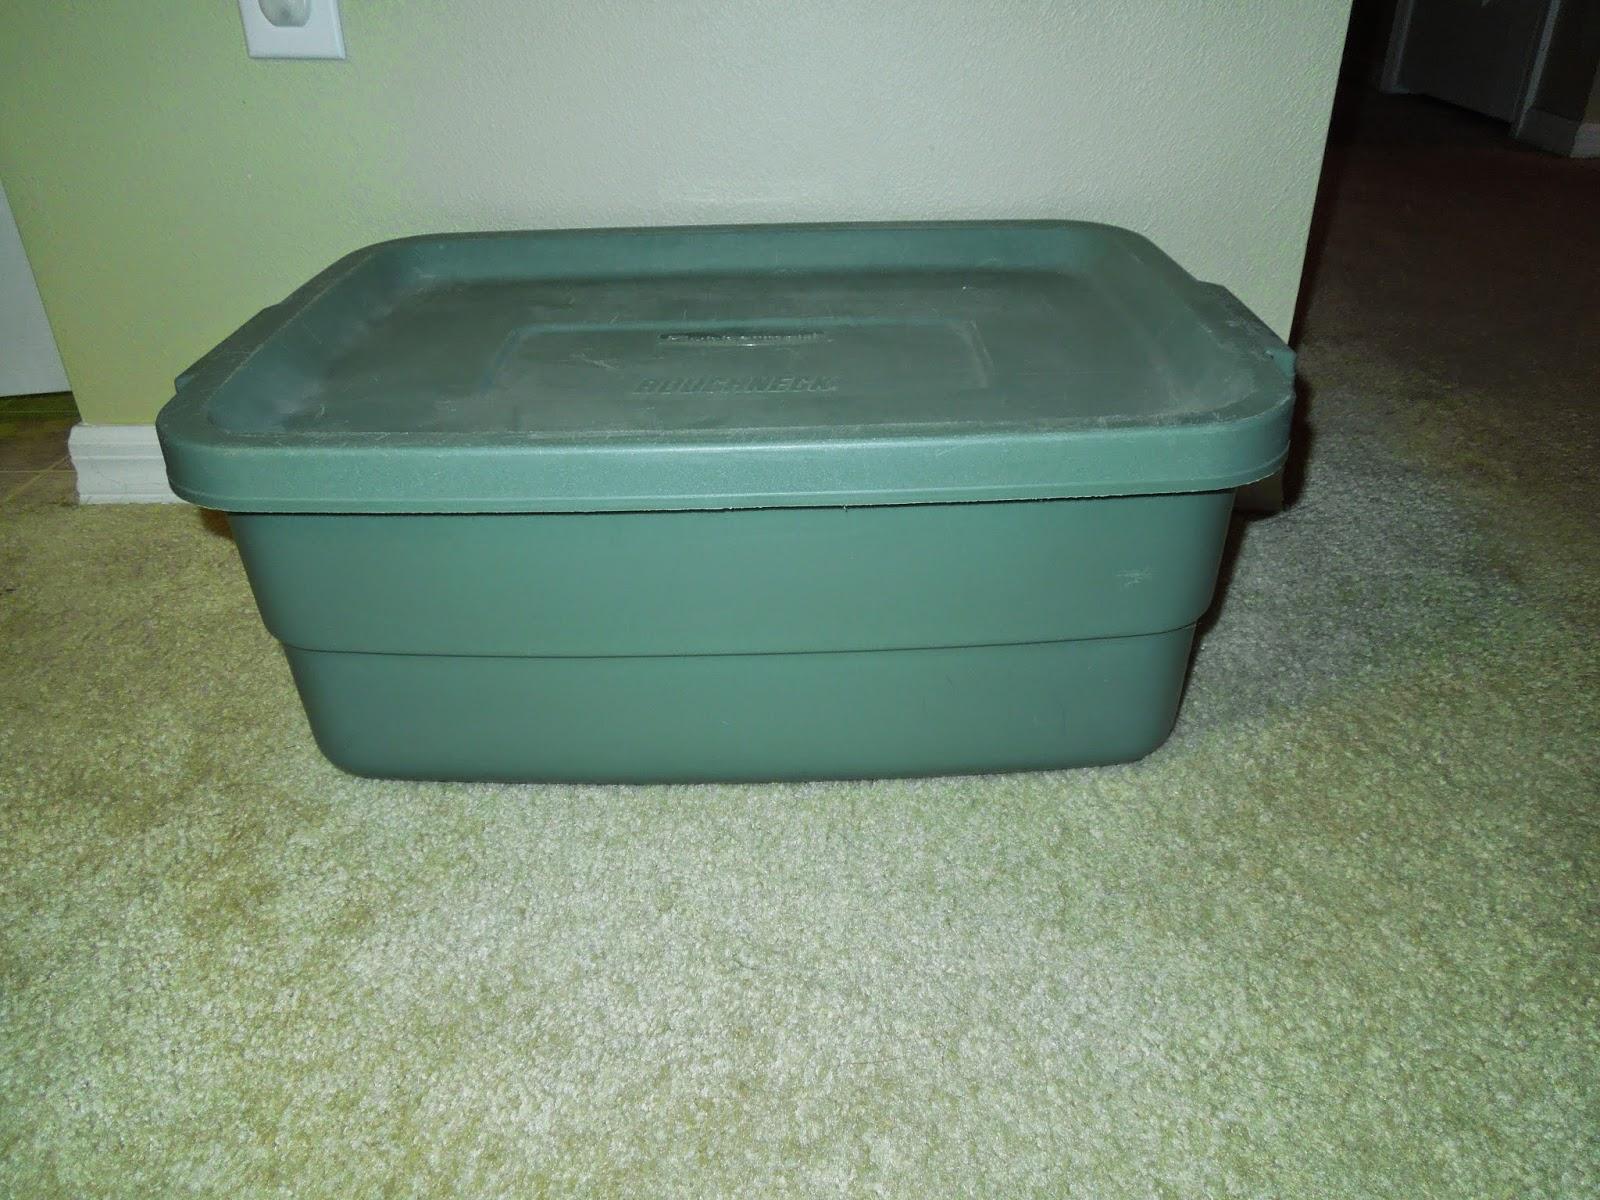 Ugly Green Bin